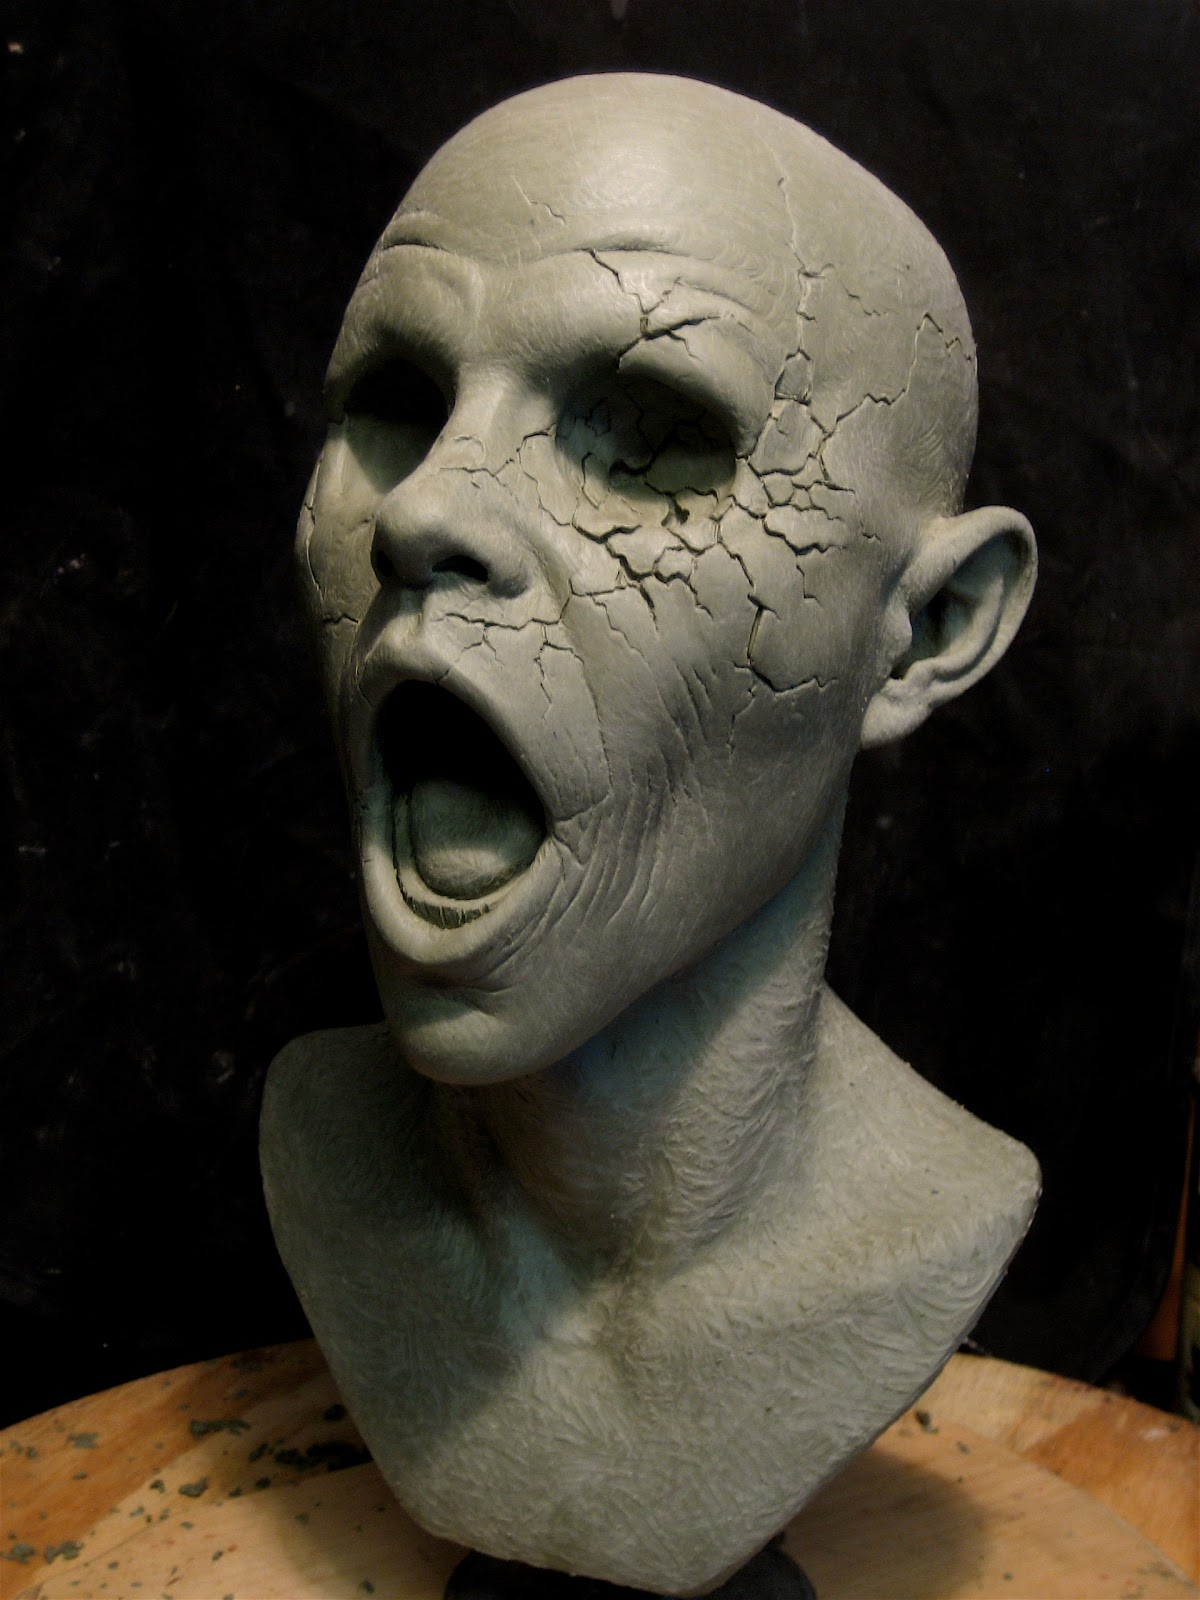 Mario Torres Design and Sculpture: October 2012